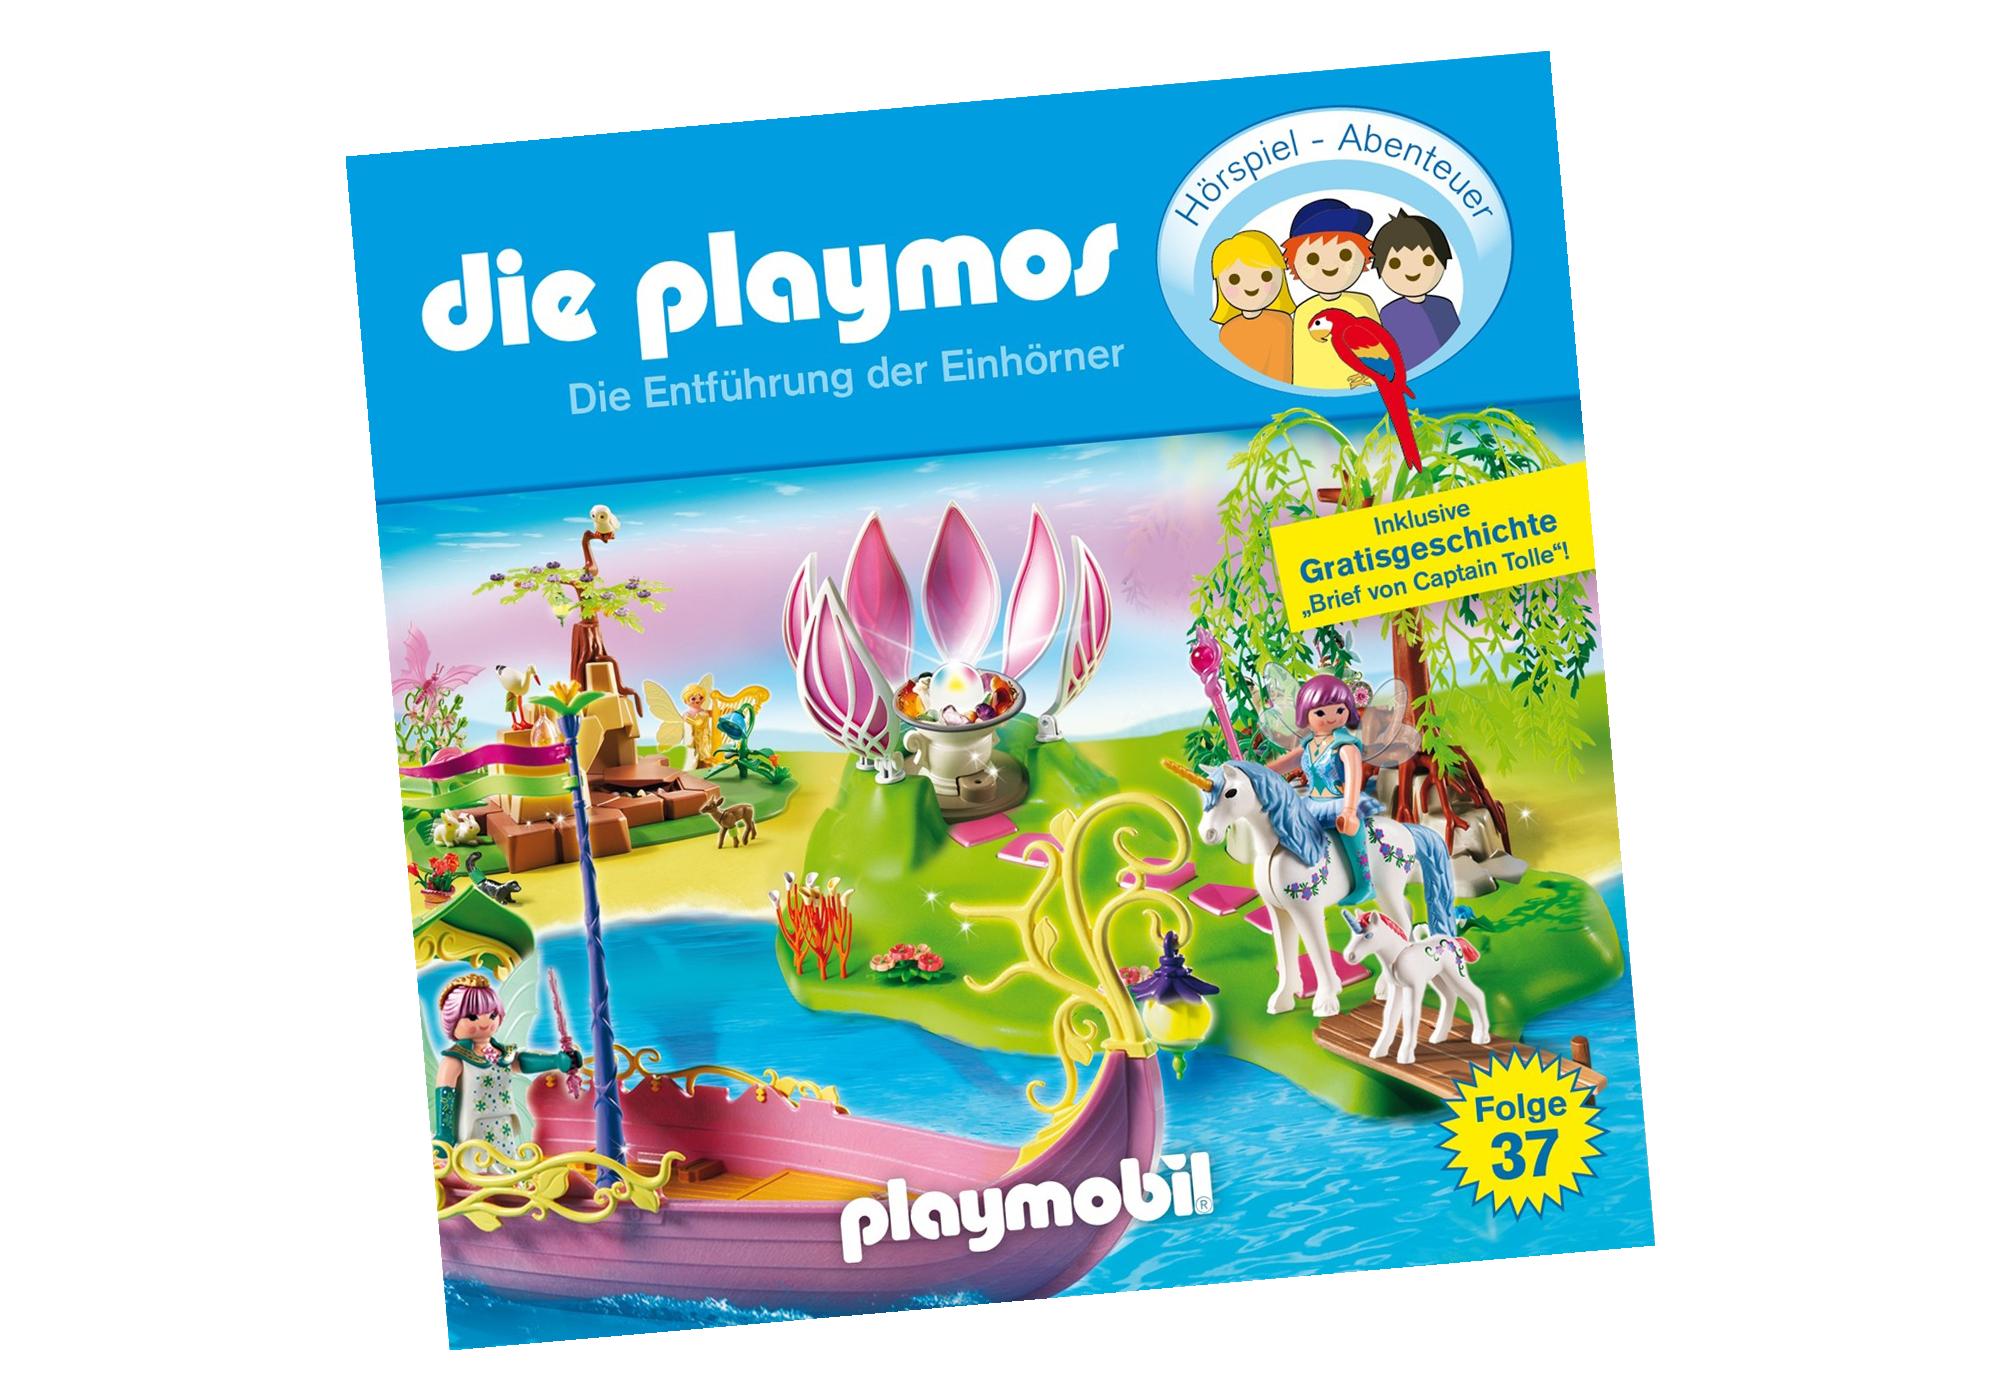 http://media.playmobil.com/i/playmobil/80450_product_detail